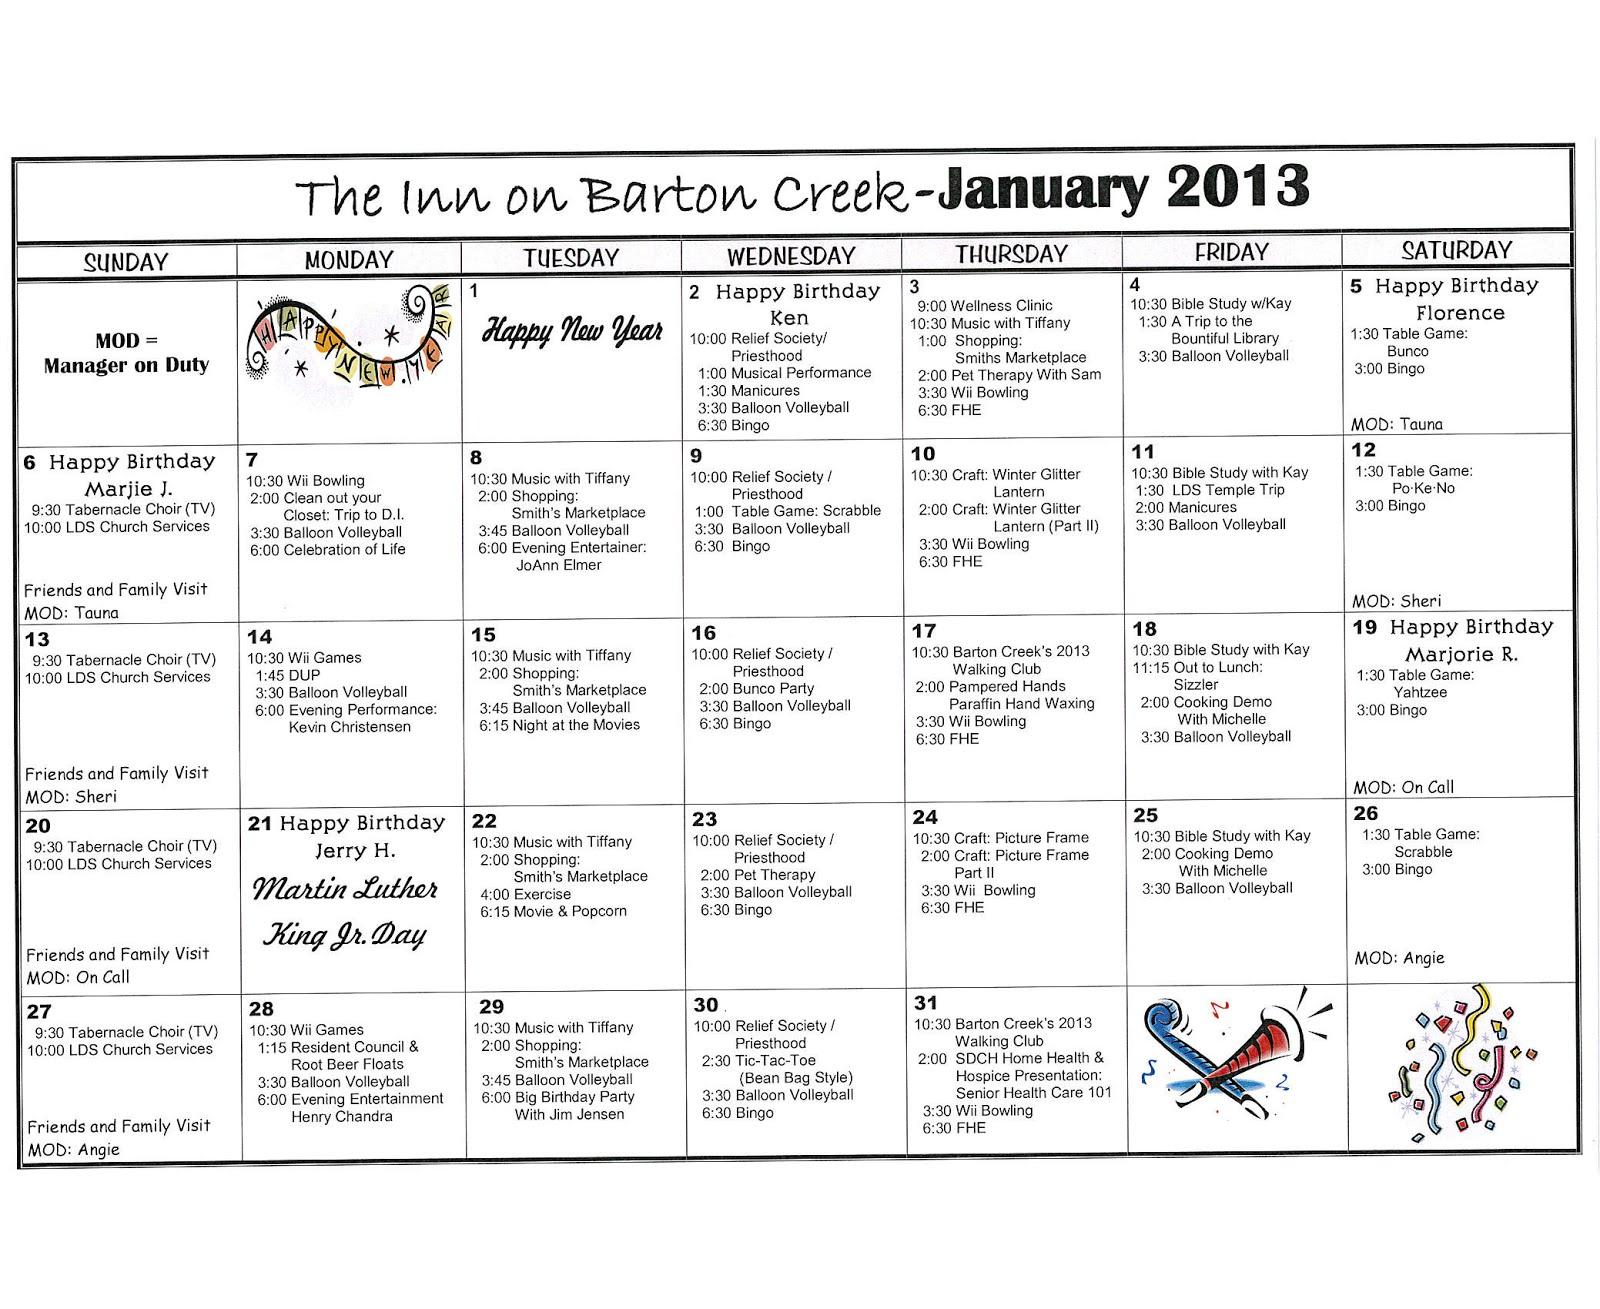 Barton Creek Assisted Living: January 2013 Activities Calendar Pertaining To Assisted Living Activities Calendar Ideas